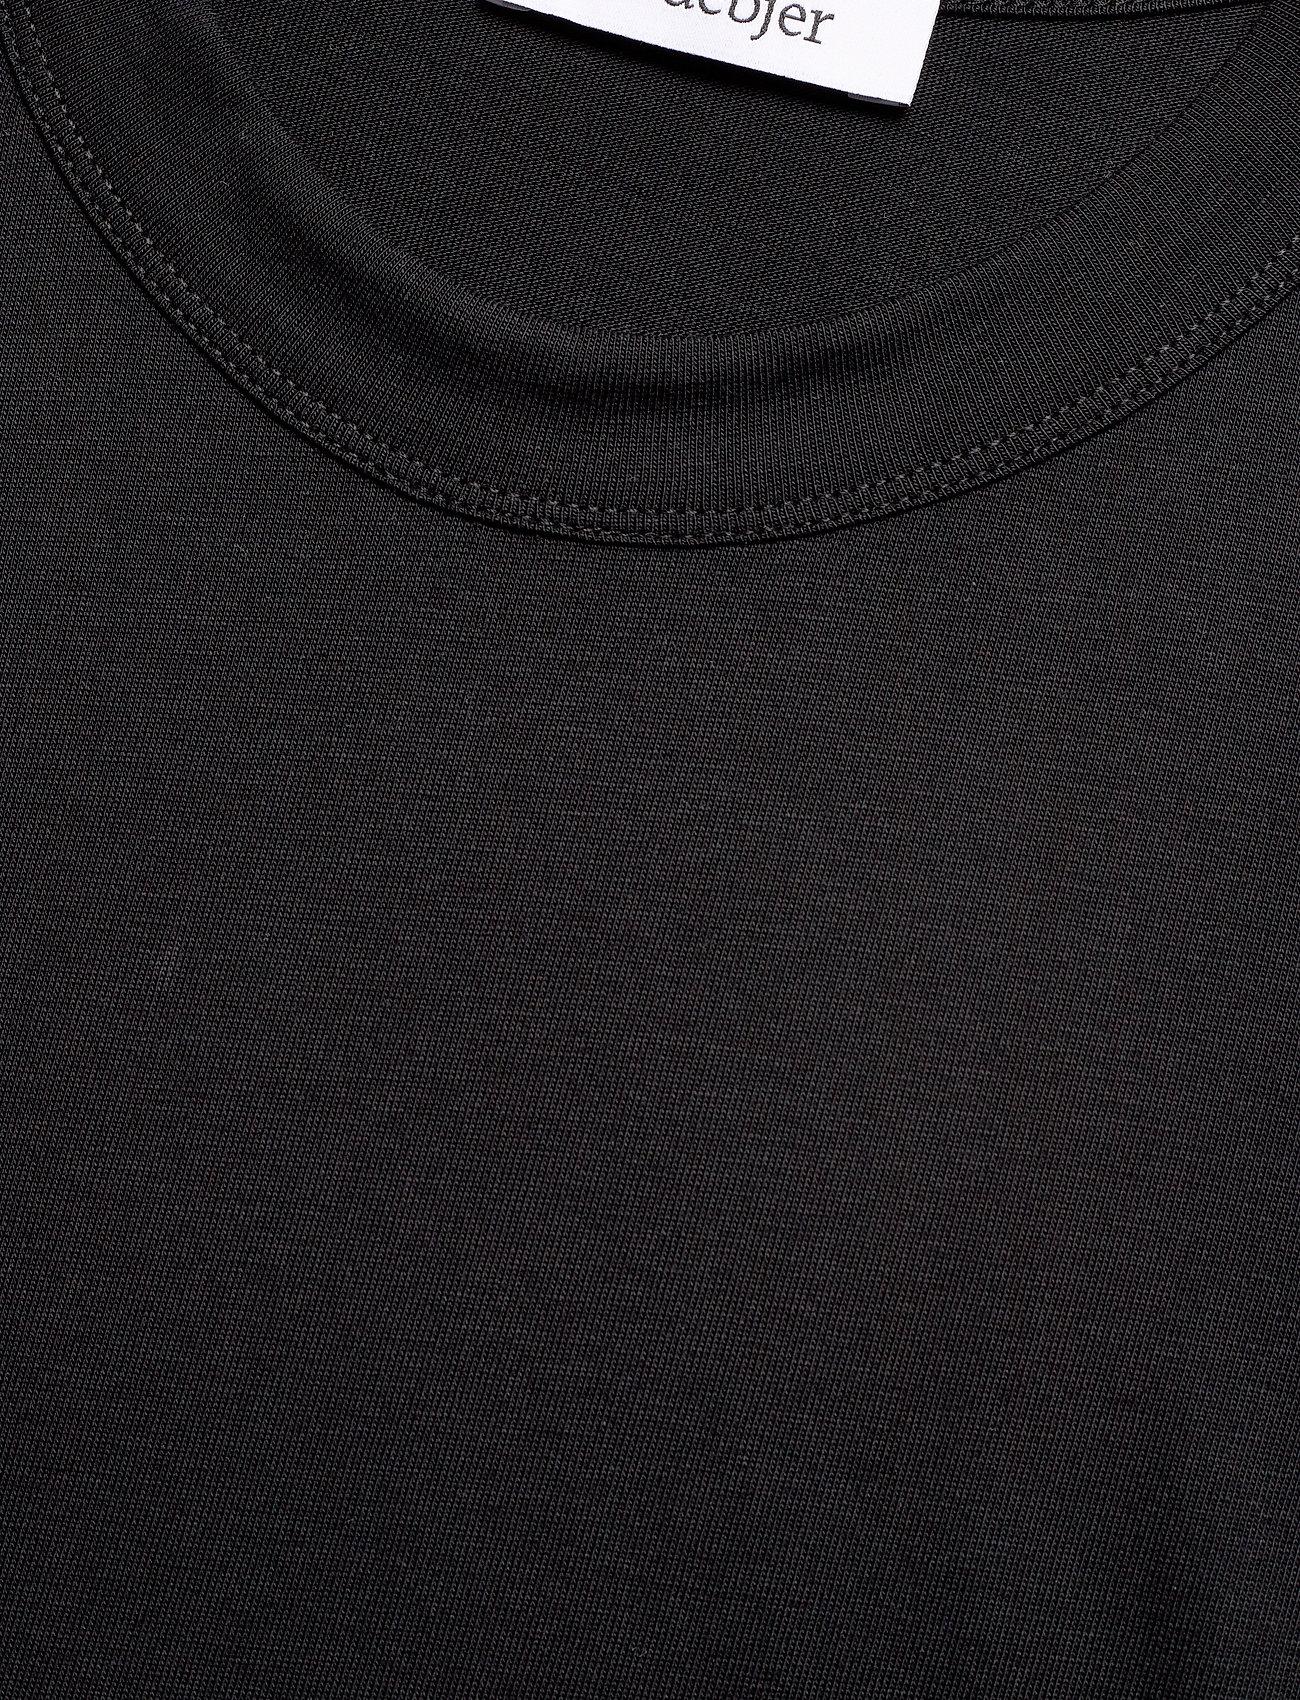 RODEBJER - RODEBJER DORY - t-shirts - black - 2